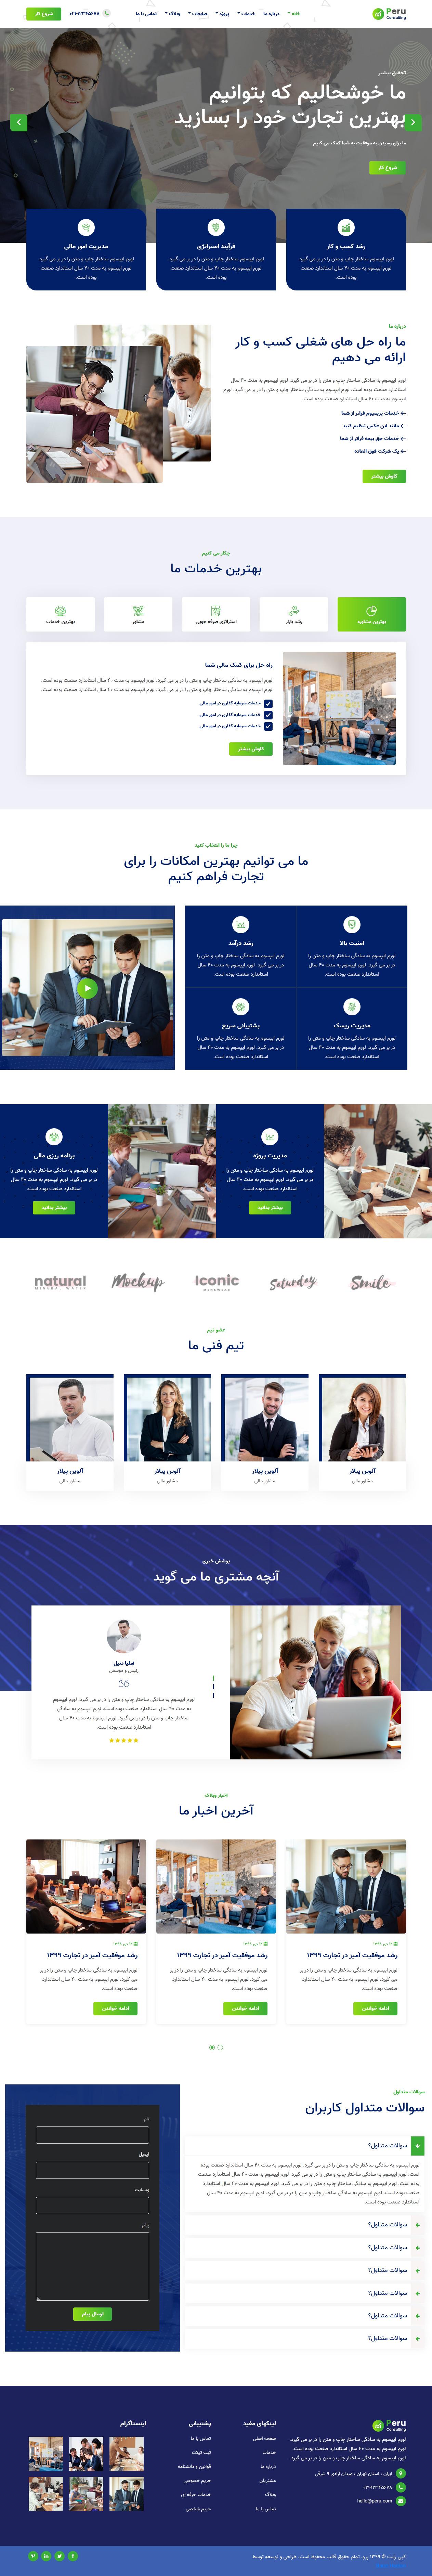 قالب HTML Peru | قالب HTML سایت شرکتی مشاوره و مشاغل